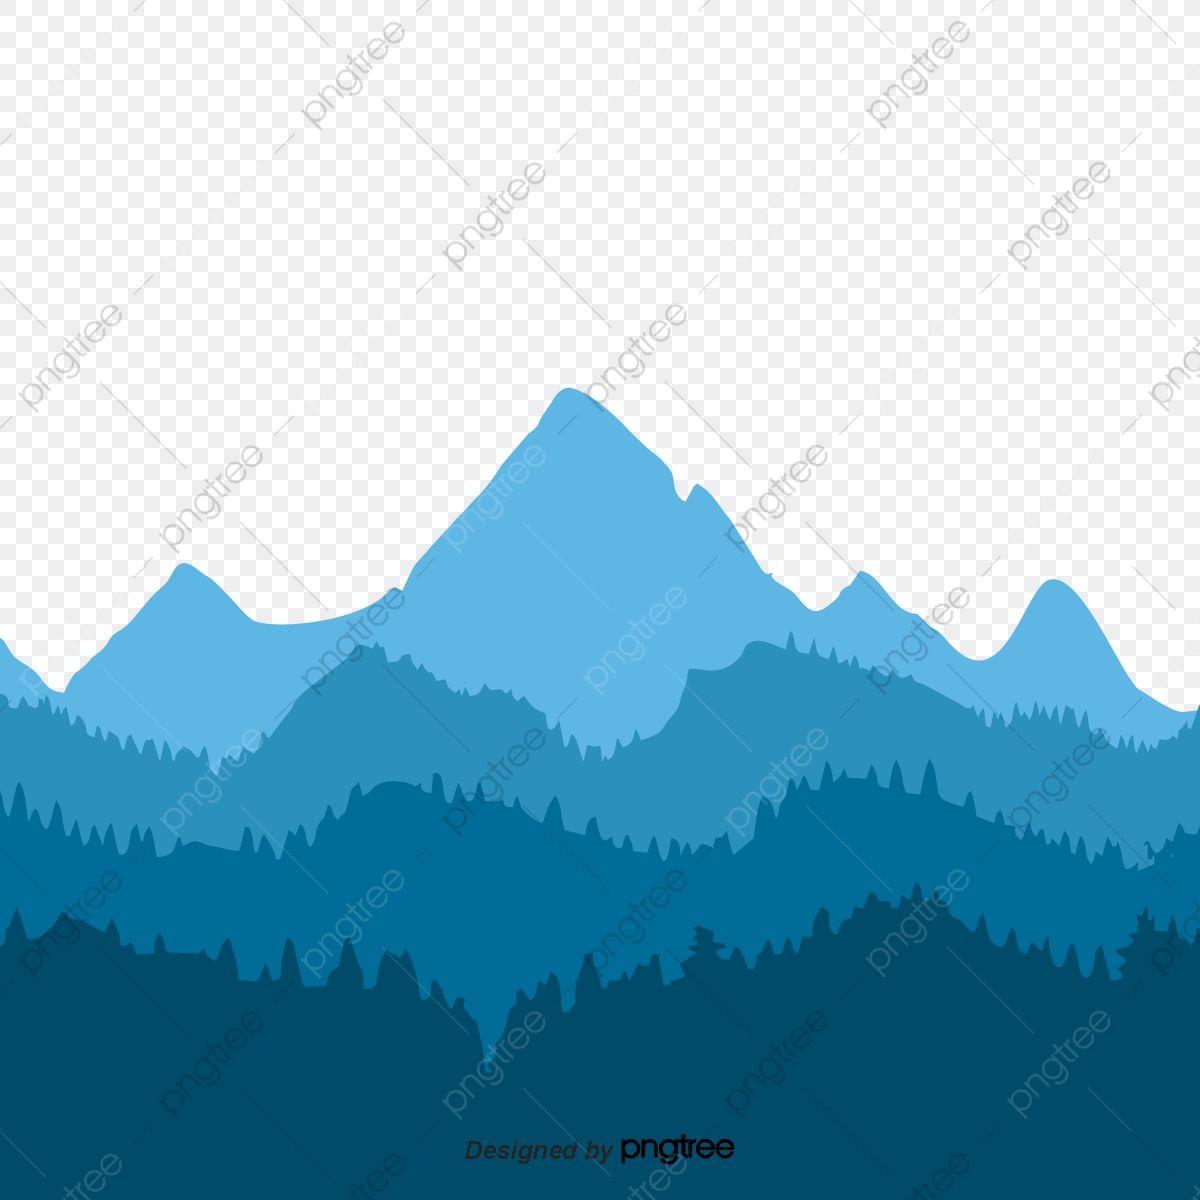 Blue Mountain Silhouette Mountain Silhouette Blue Mountain Blue Poster